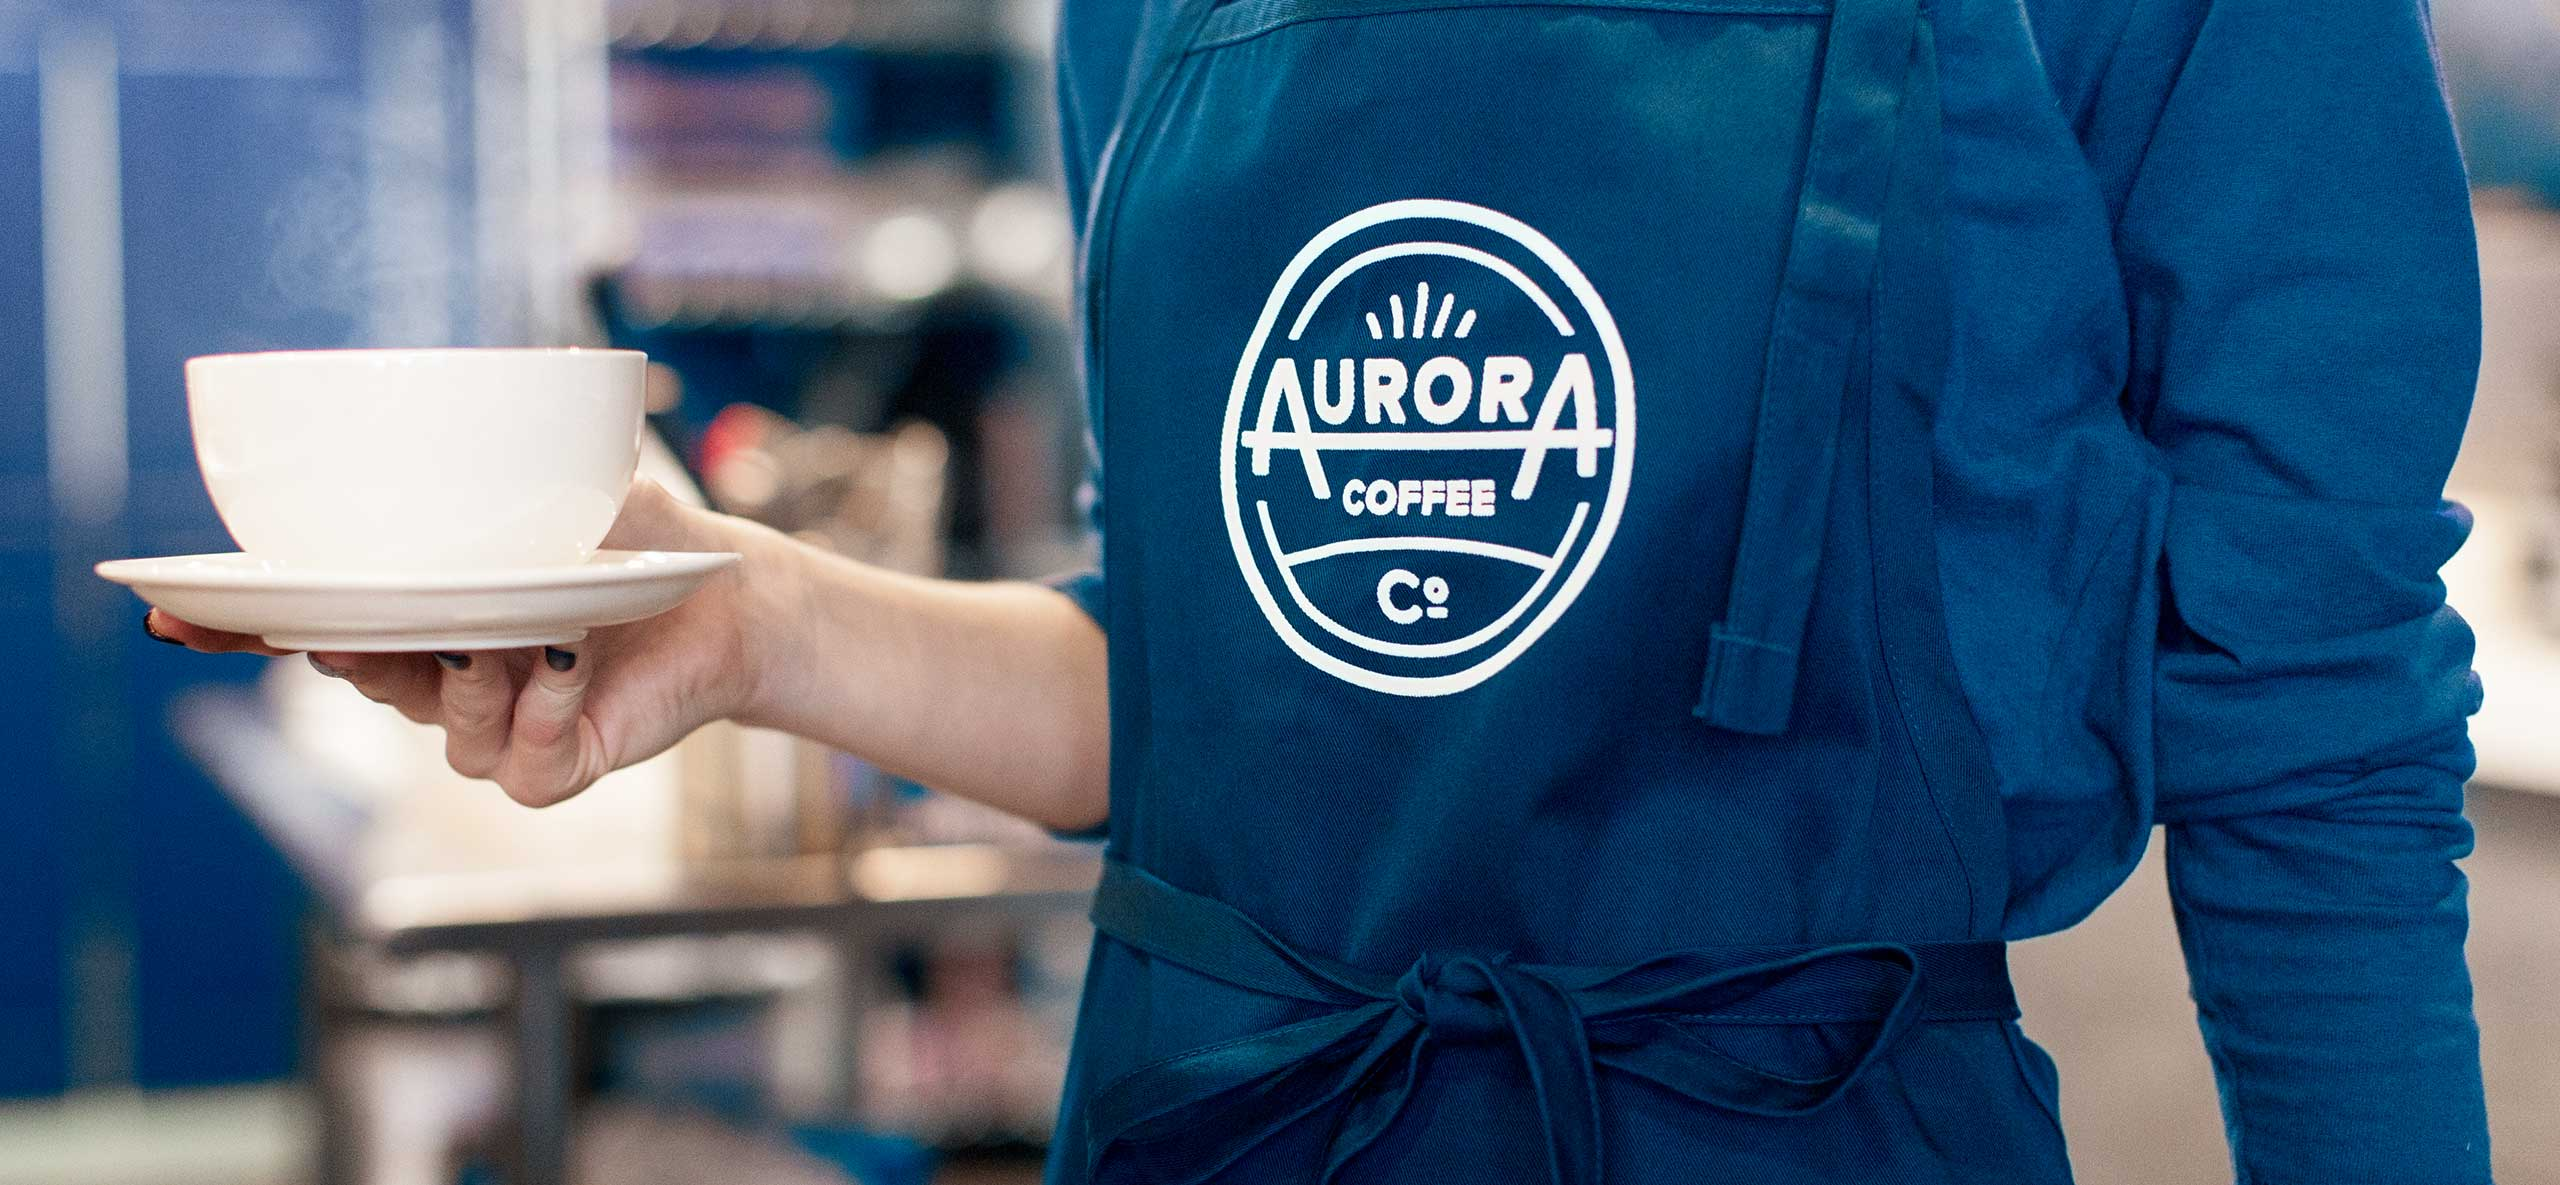 Aurora Barista holding coffee mug in apron